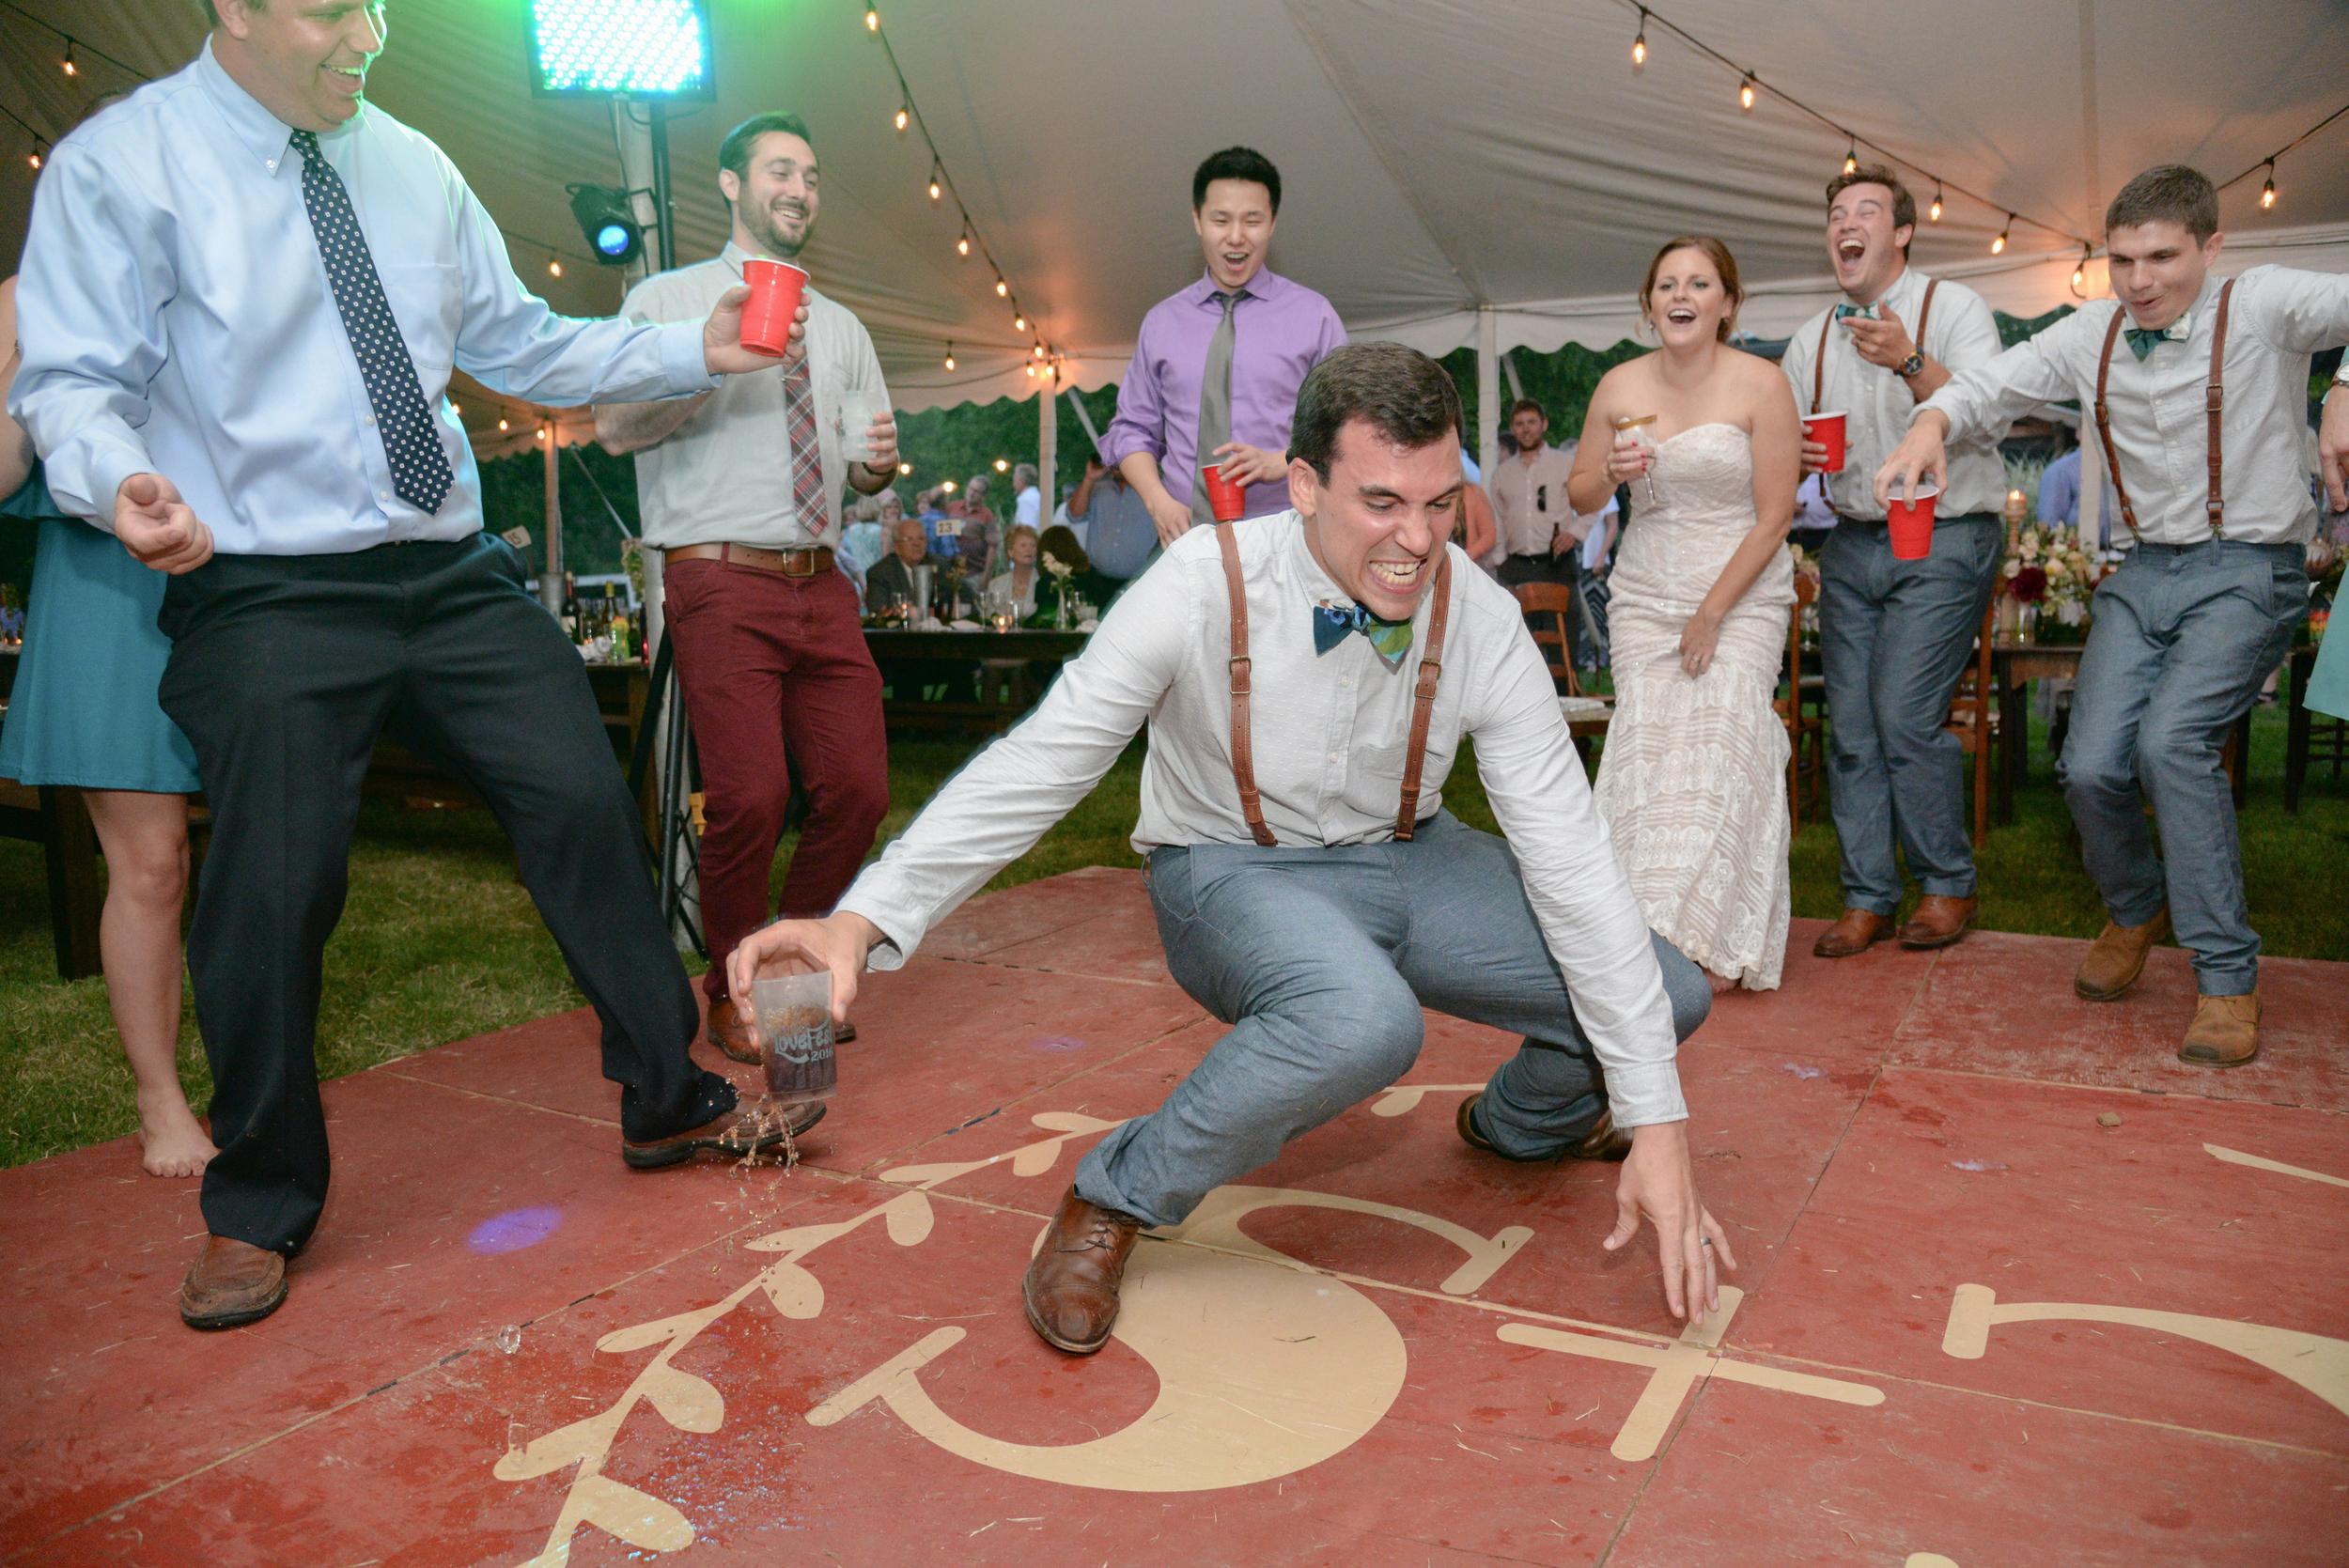 st louis wedding reception candid dancing